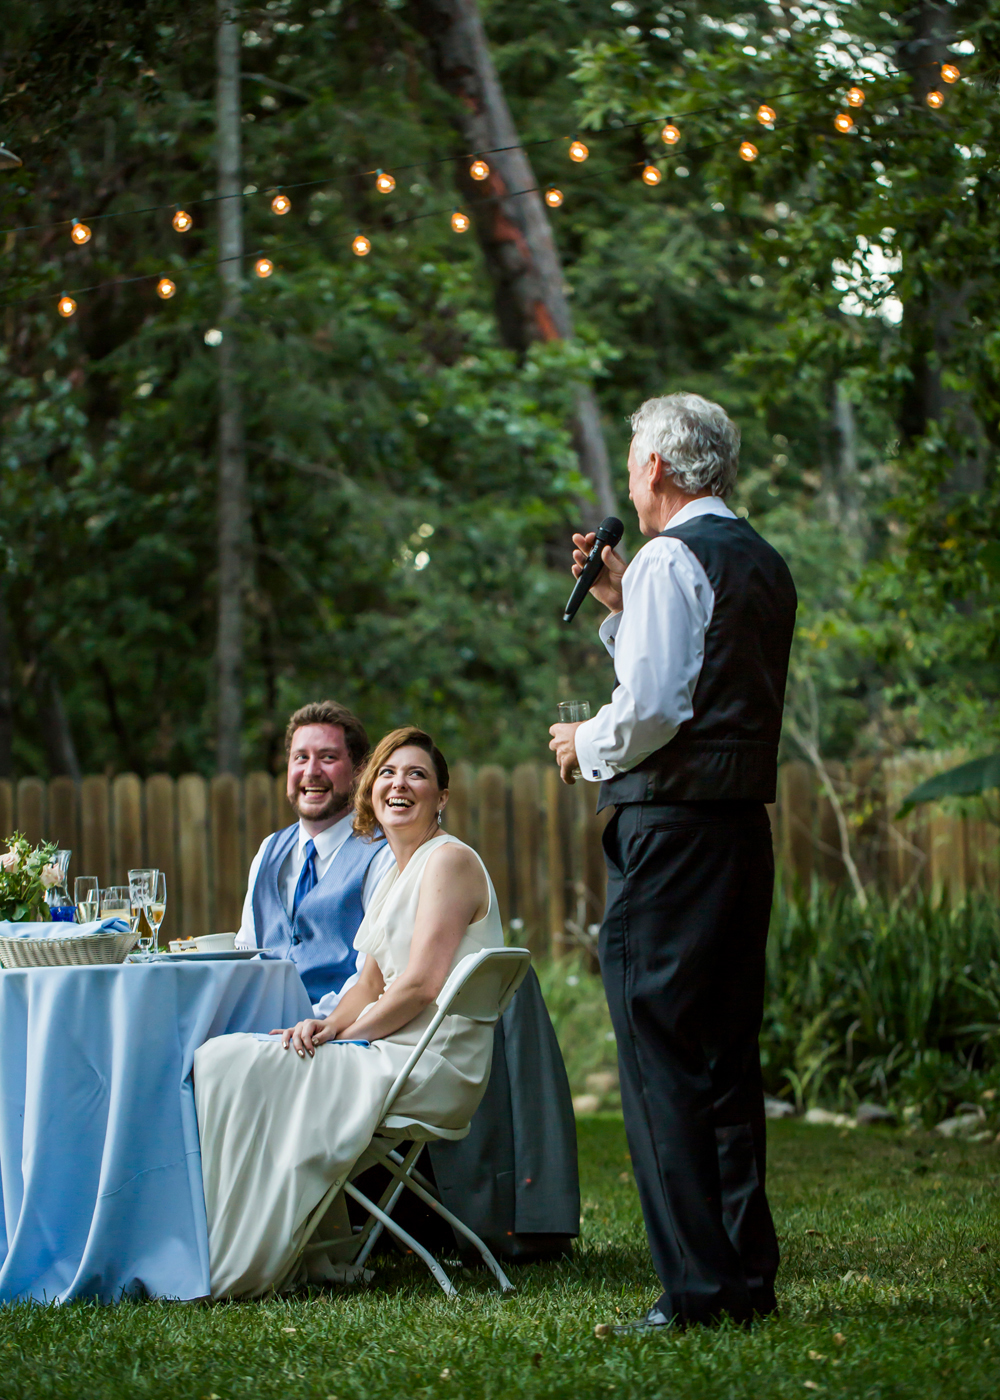 pema-osel-ling-santa-cruz-wedding-photography-lilouette-78.jpg